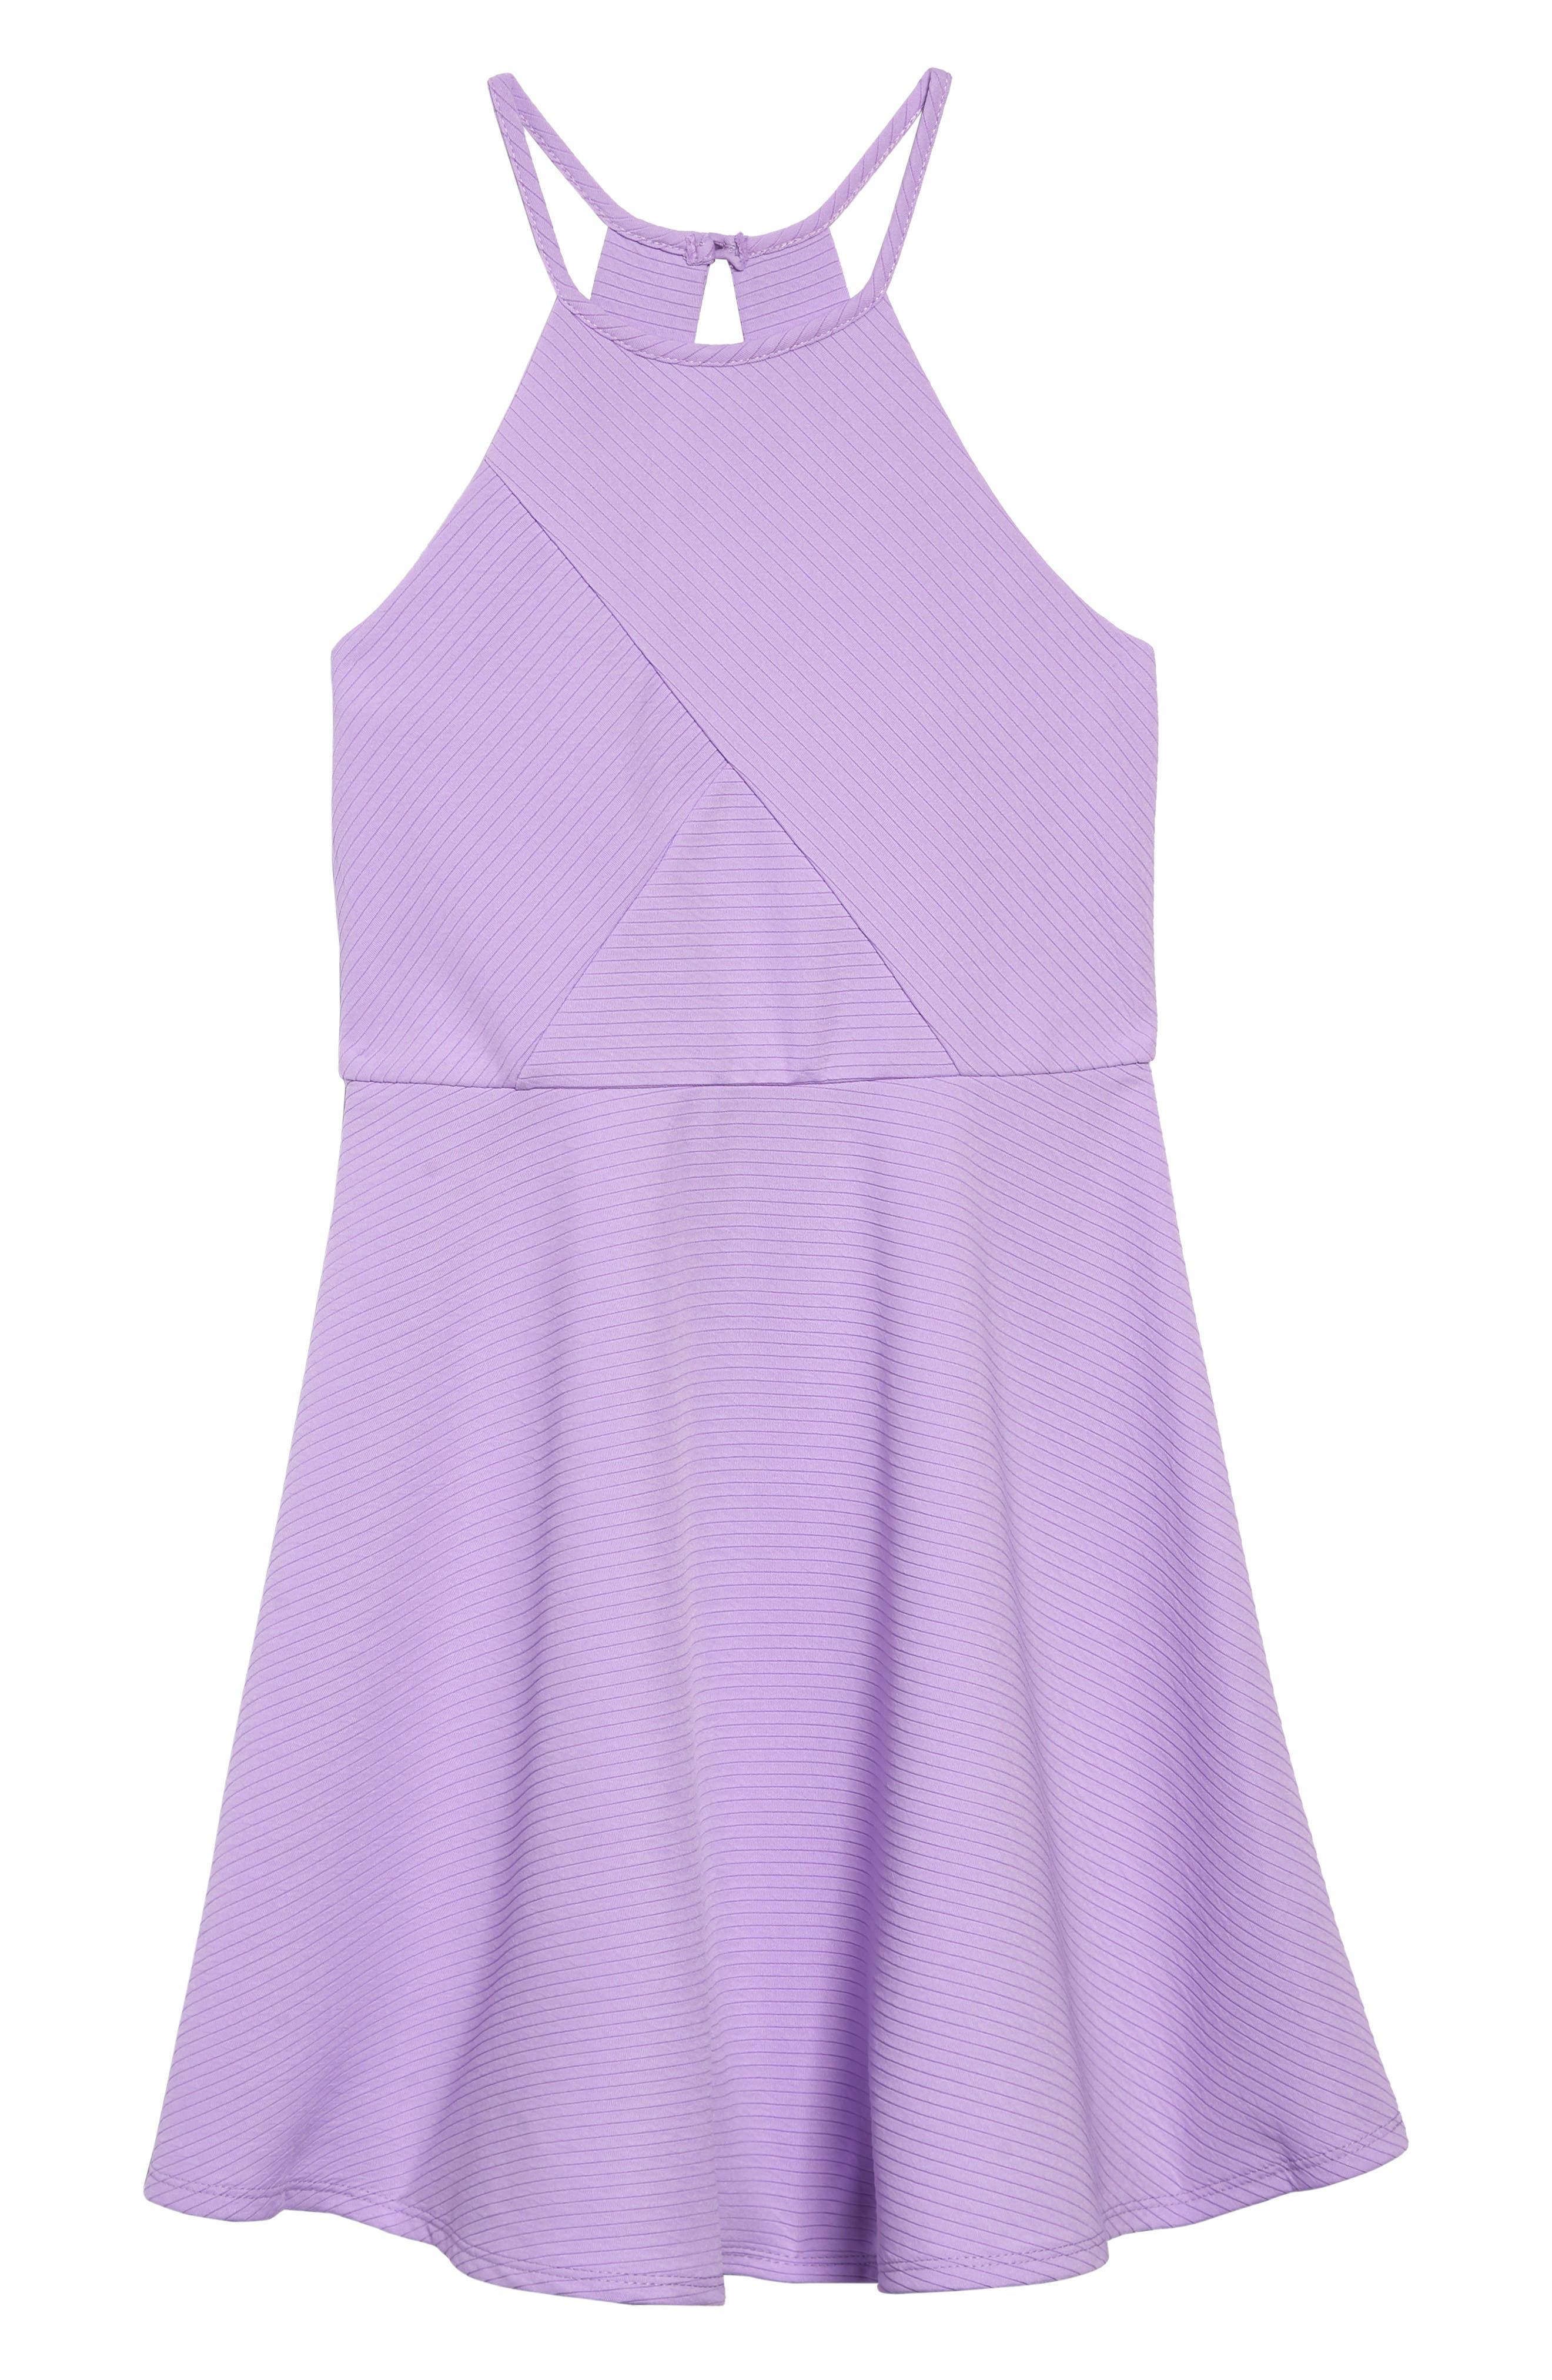 ZUNIE Textured Skater Dress, Main, color, LILAC